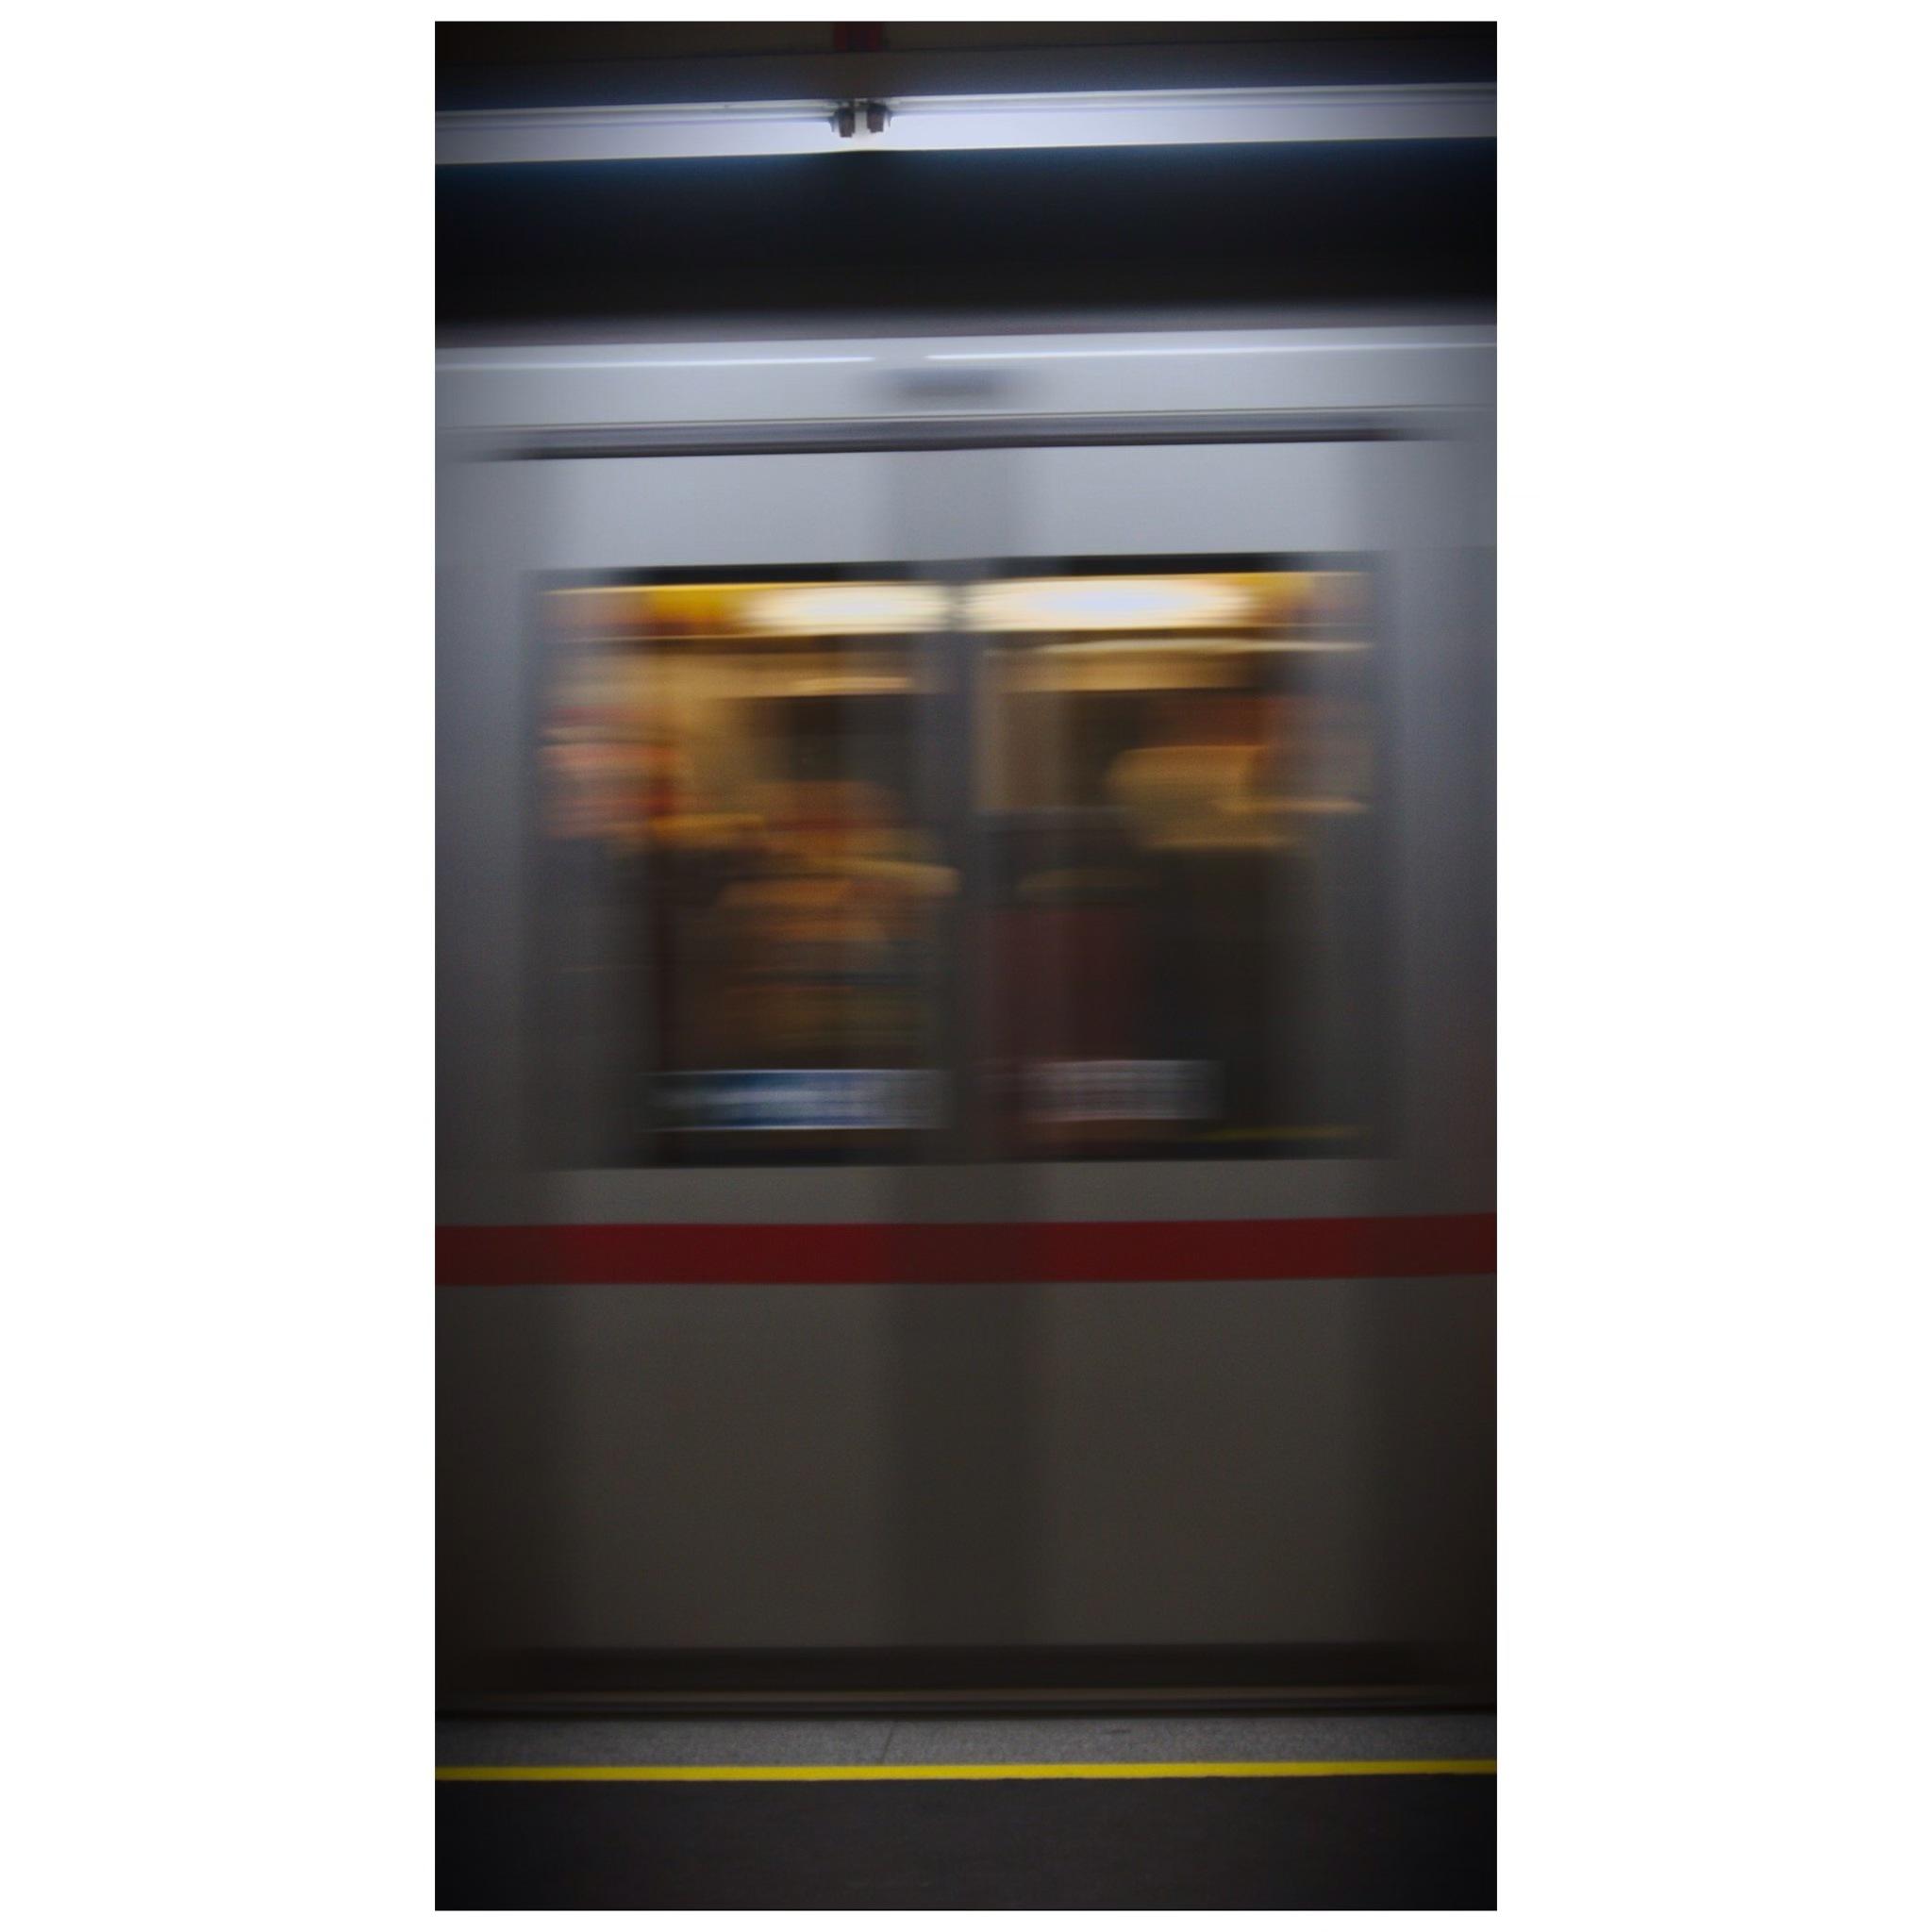 train's leaving  by Jaqshi